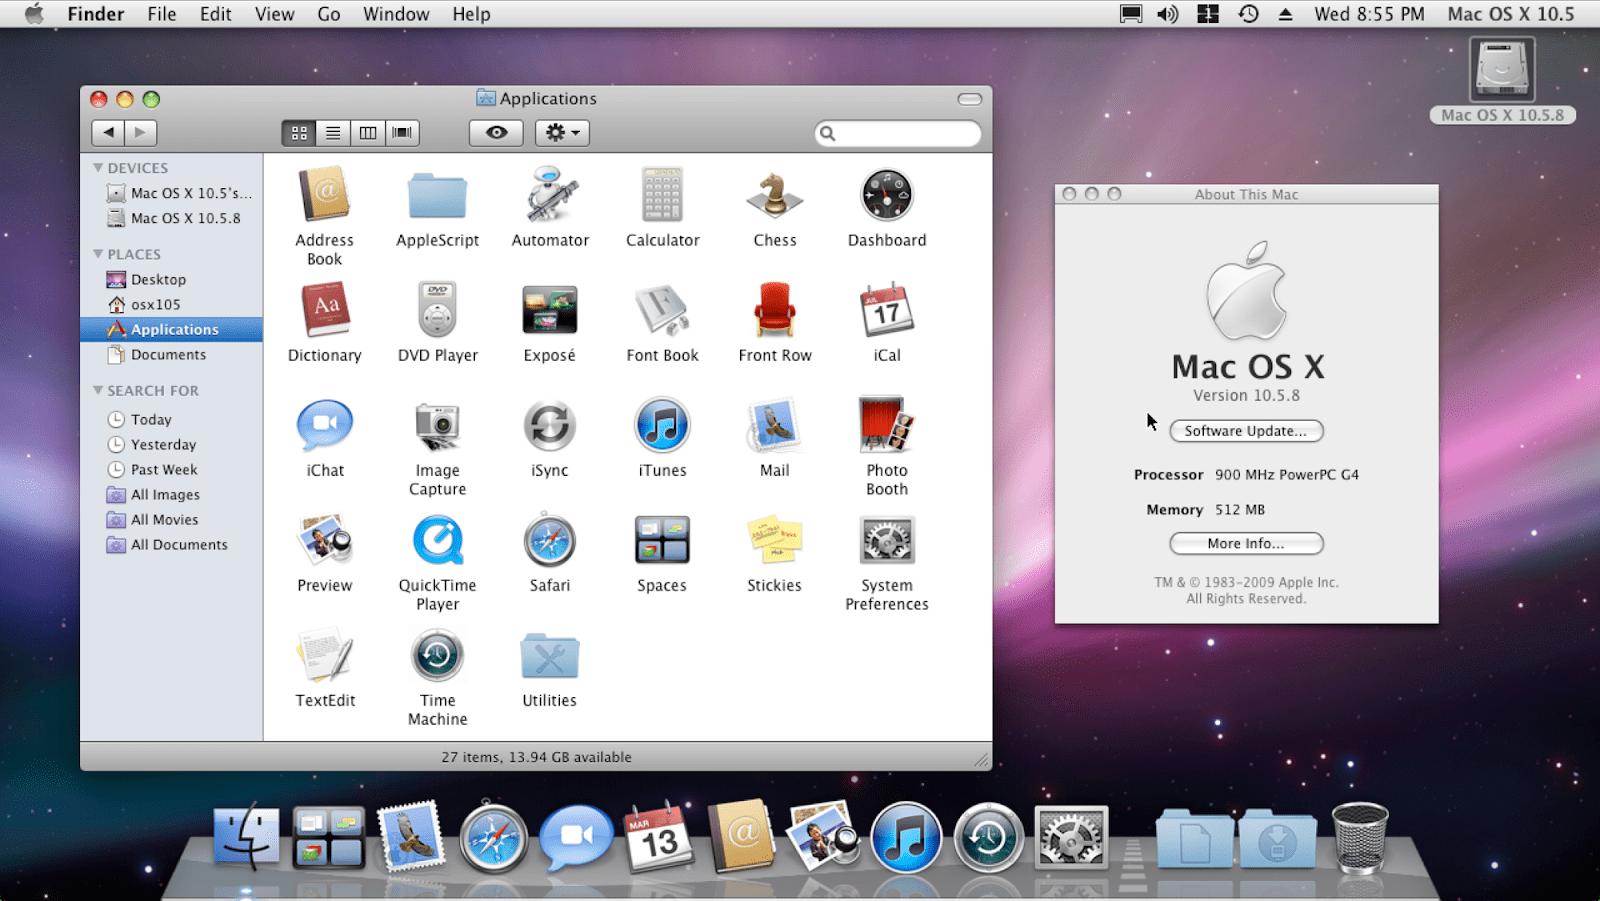 Mac OS X 10.5 (Leopard)